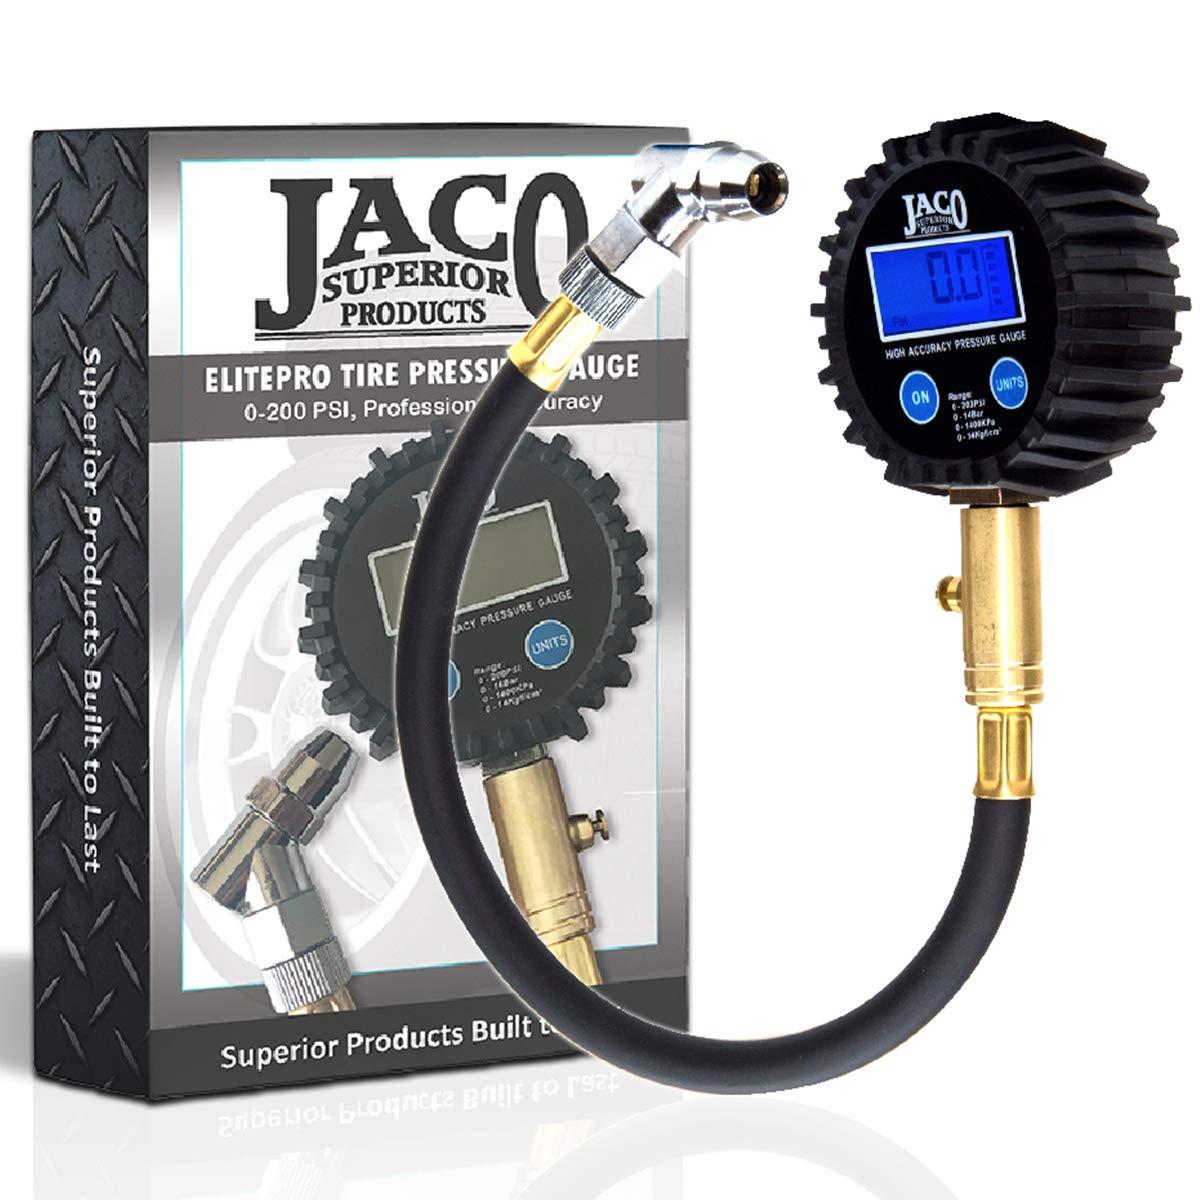 JACO ElitePro Digital Tire Pressure Gauge - Professional Accuracy - 200 PSI